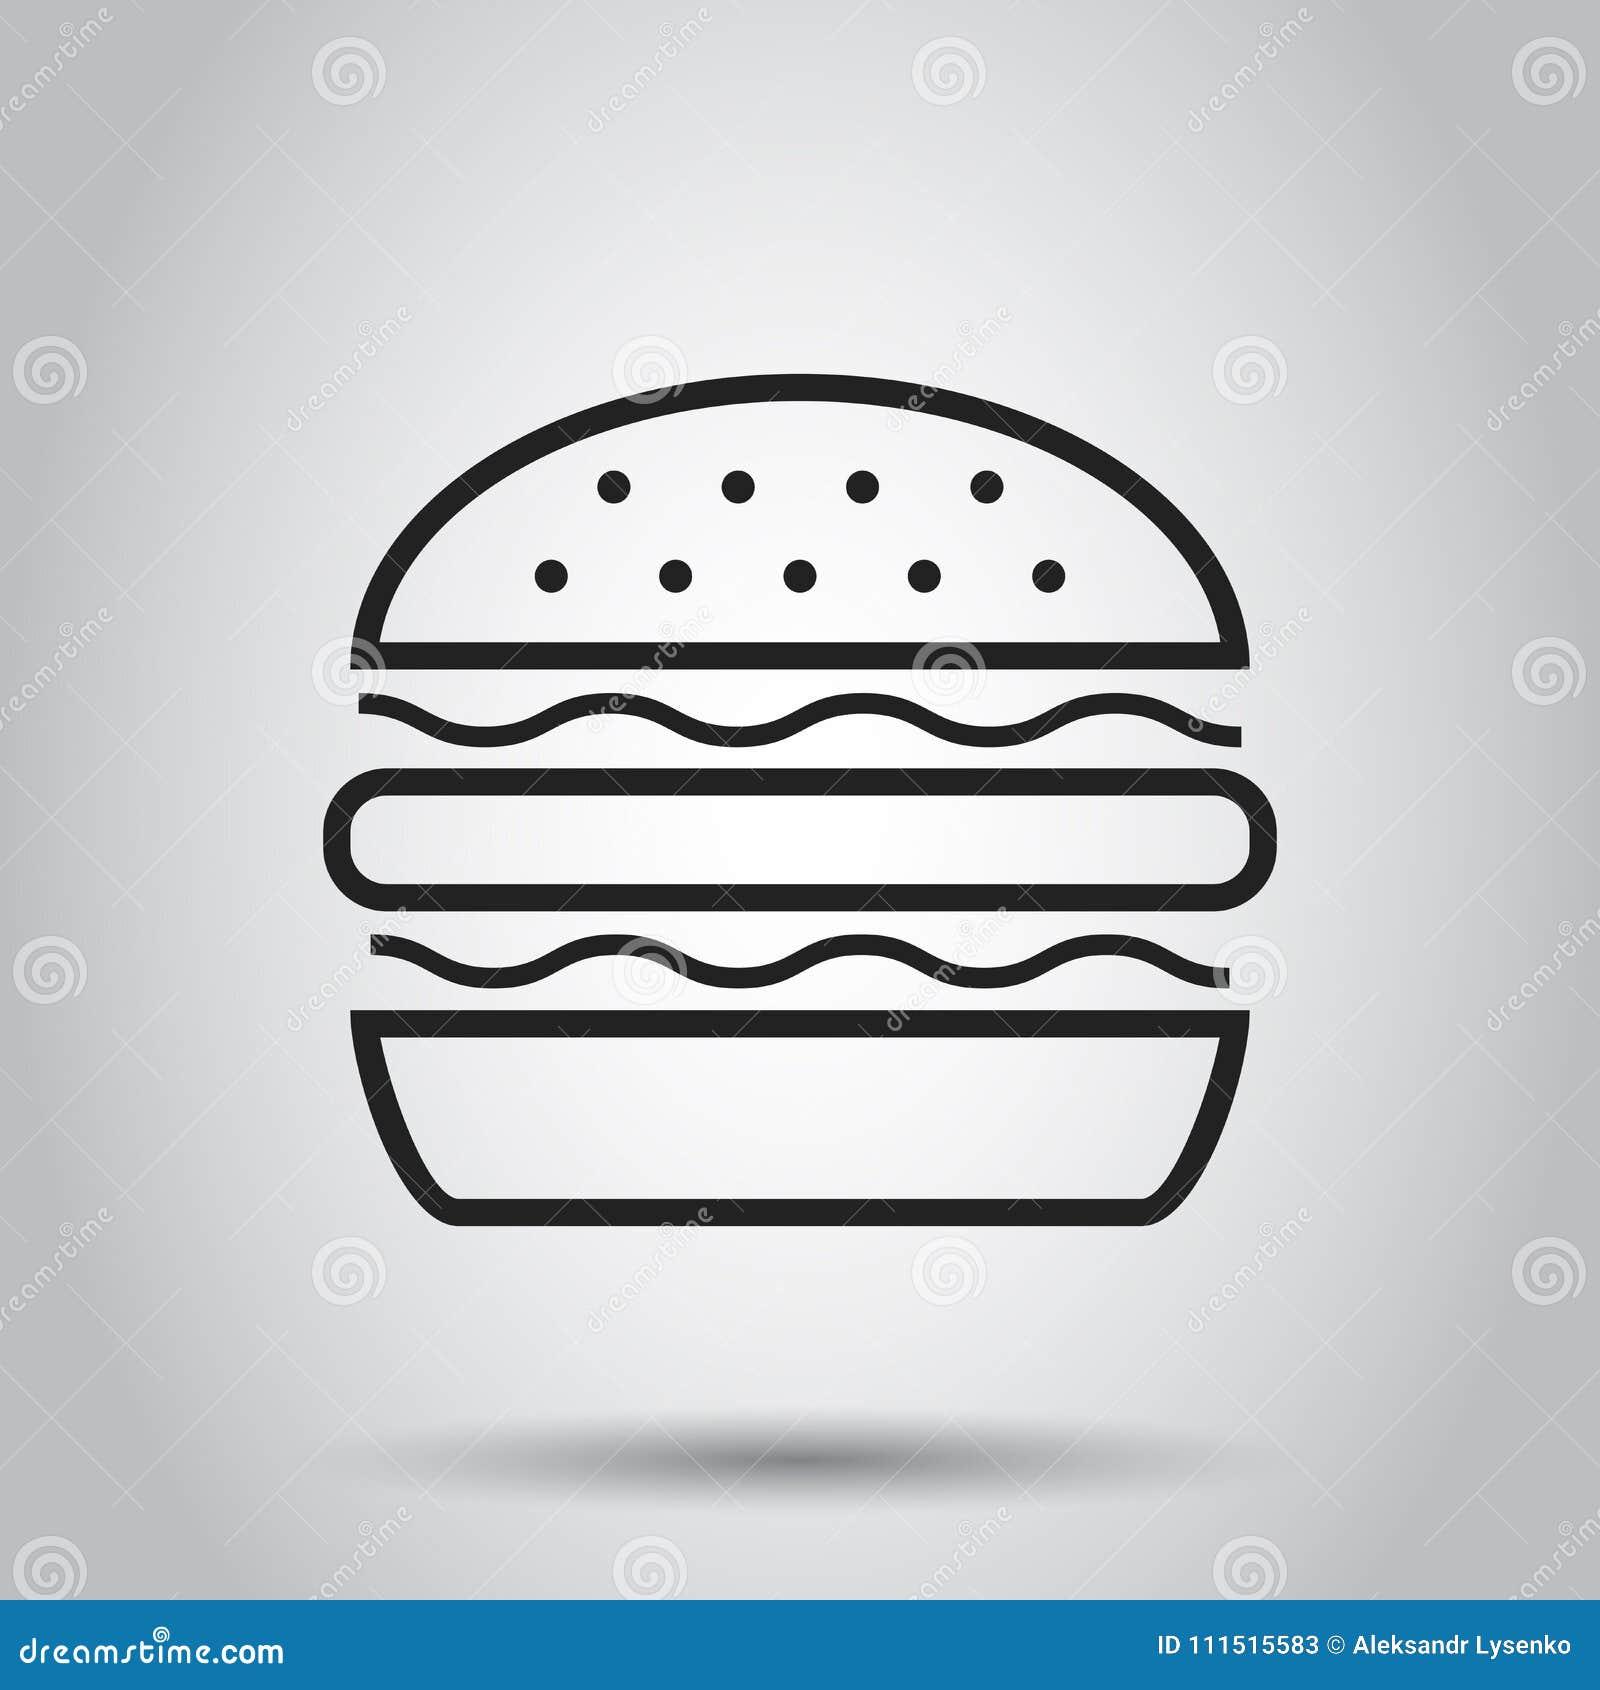 Ícone liso do vetor do fast food do hamburguer Illustr do logotipo do símbolo do Hamburger